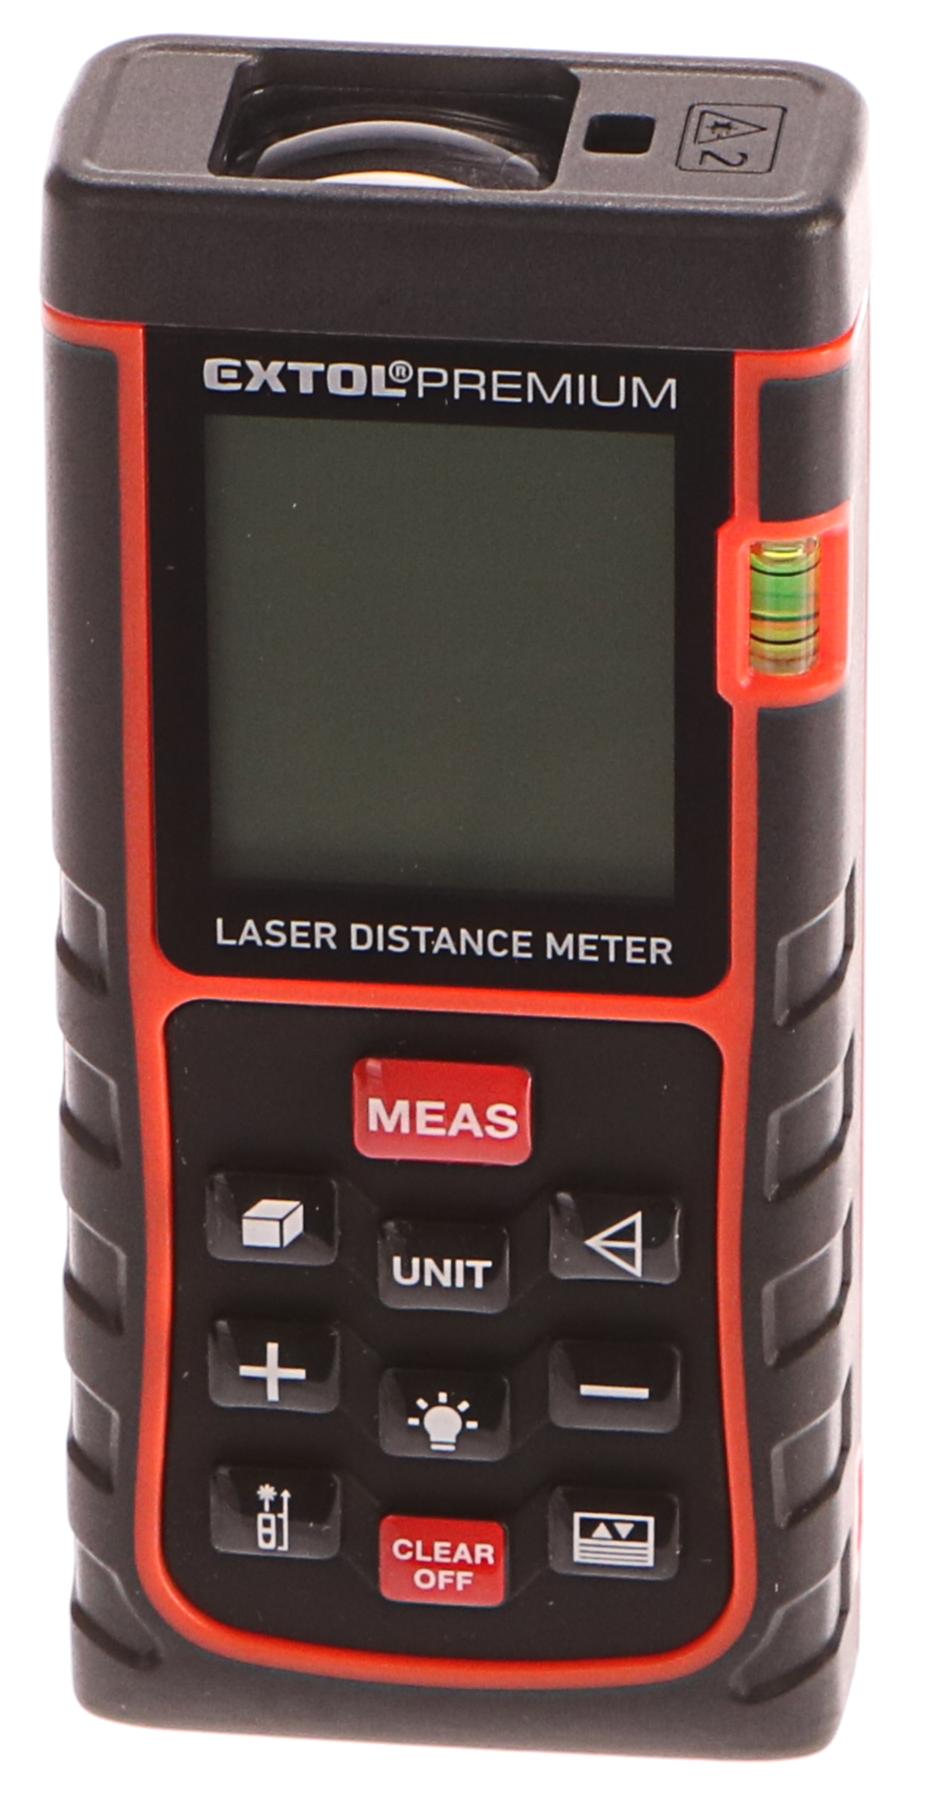 Metr laserový digitální, 0,05-40m EXTOL PREMIUM